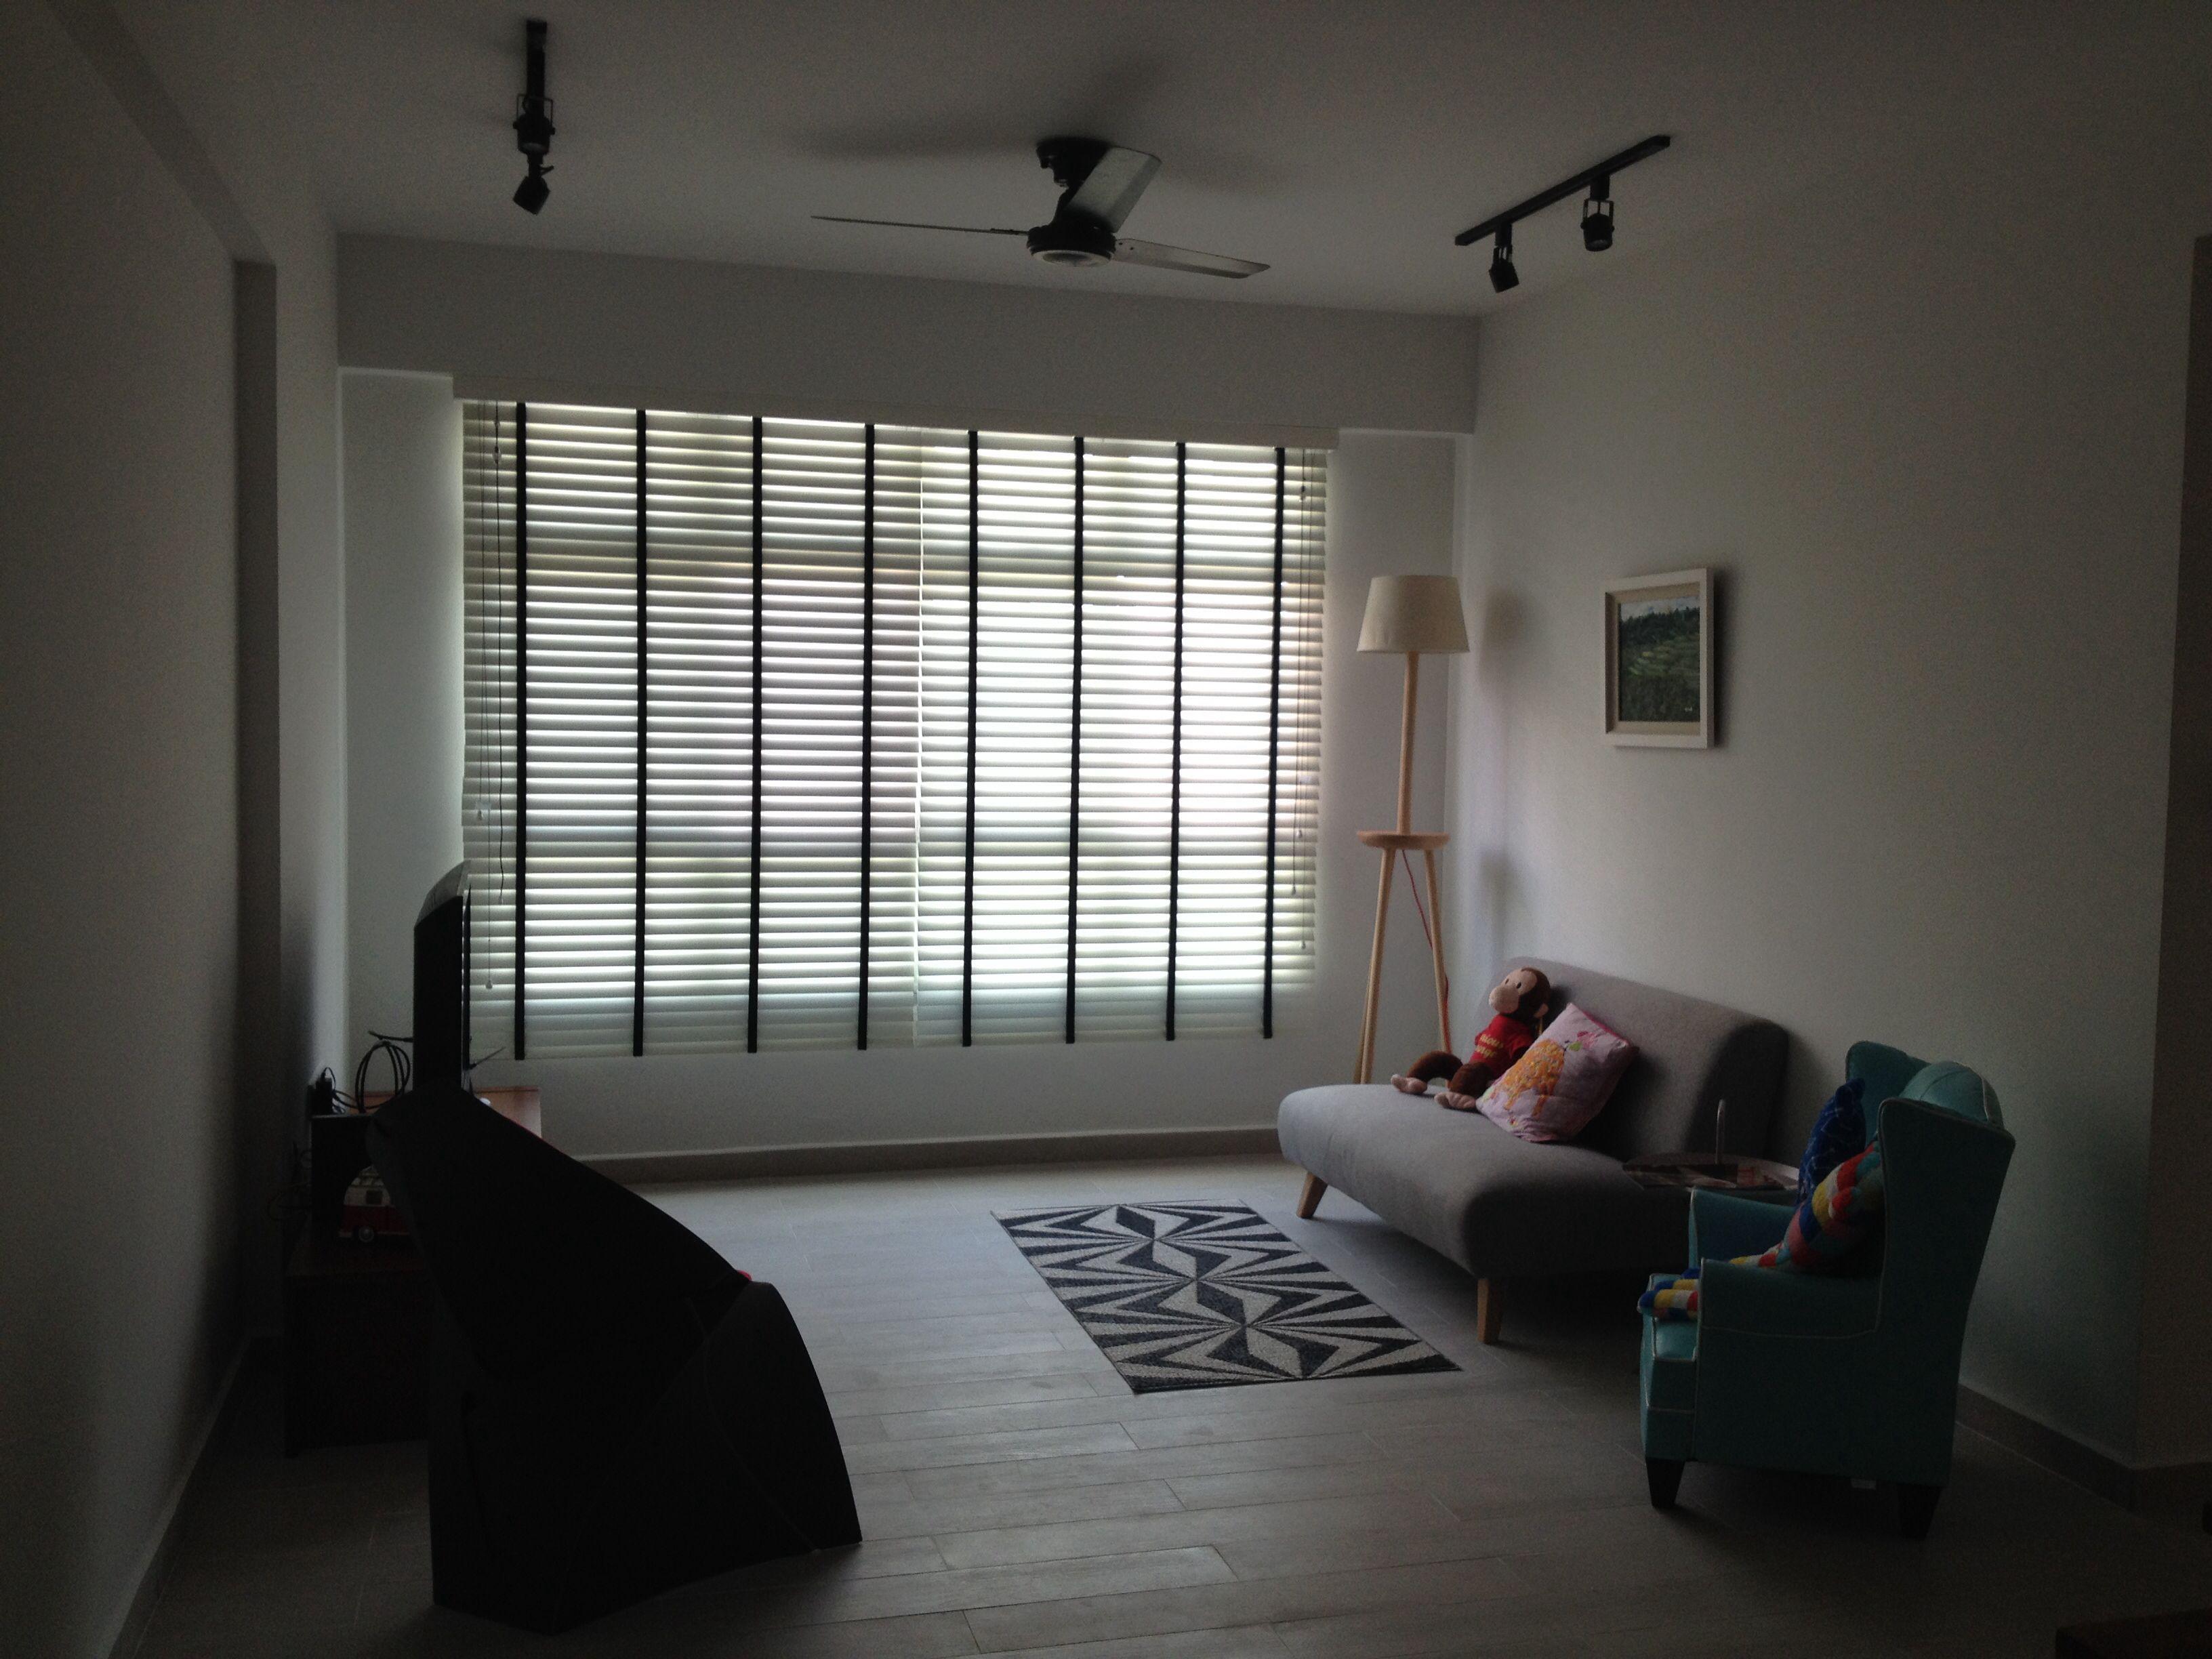 Interior designer wee studio location tampines hdb cost of renovation - Interiors